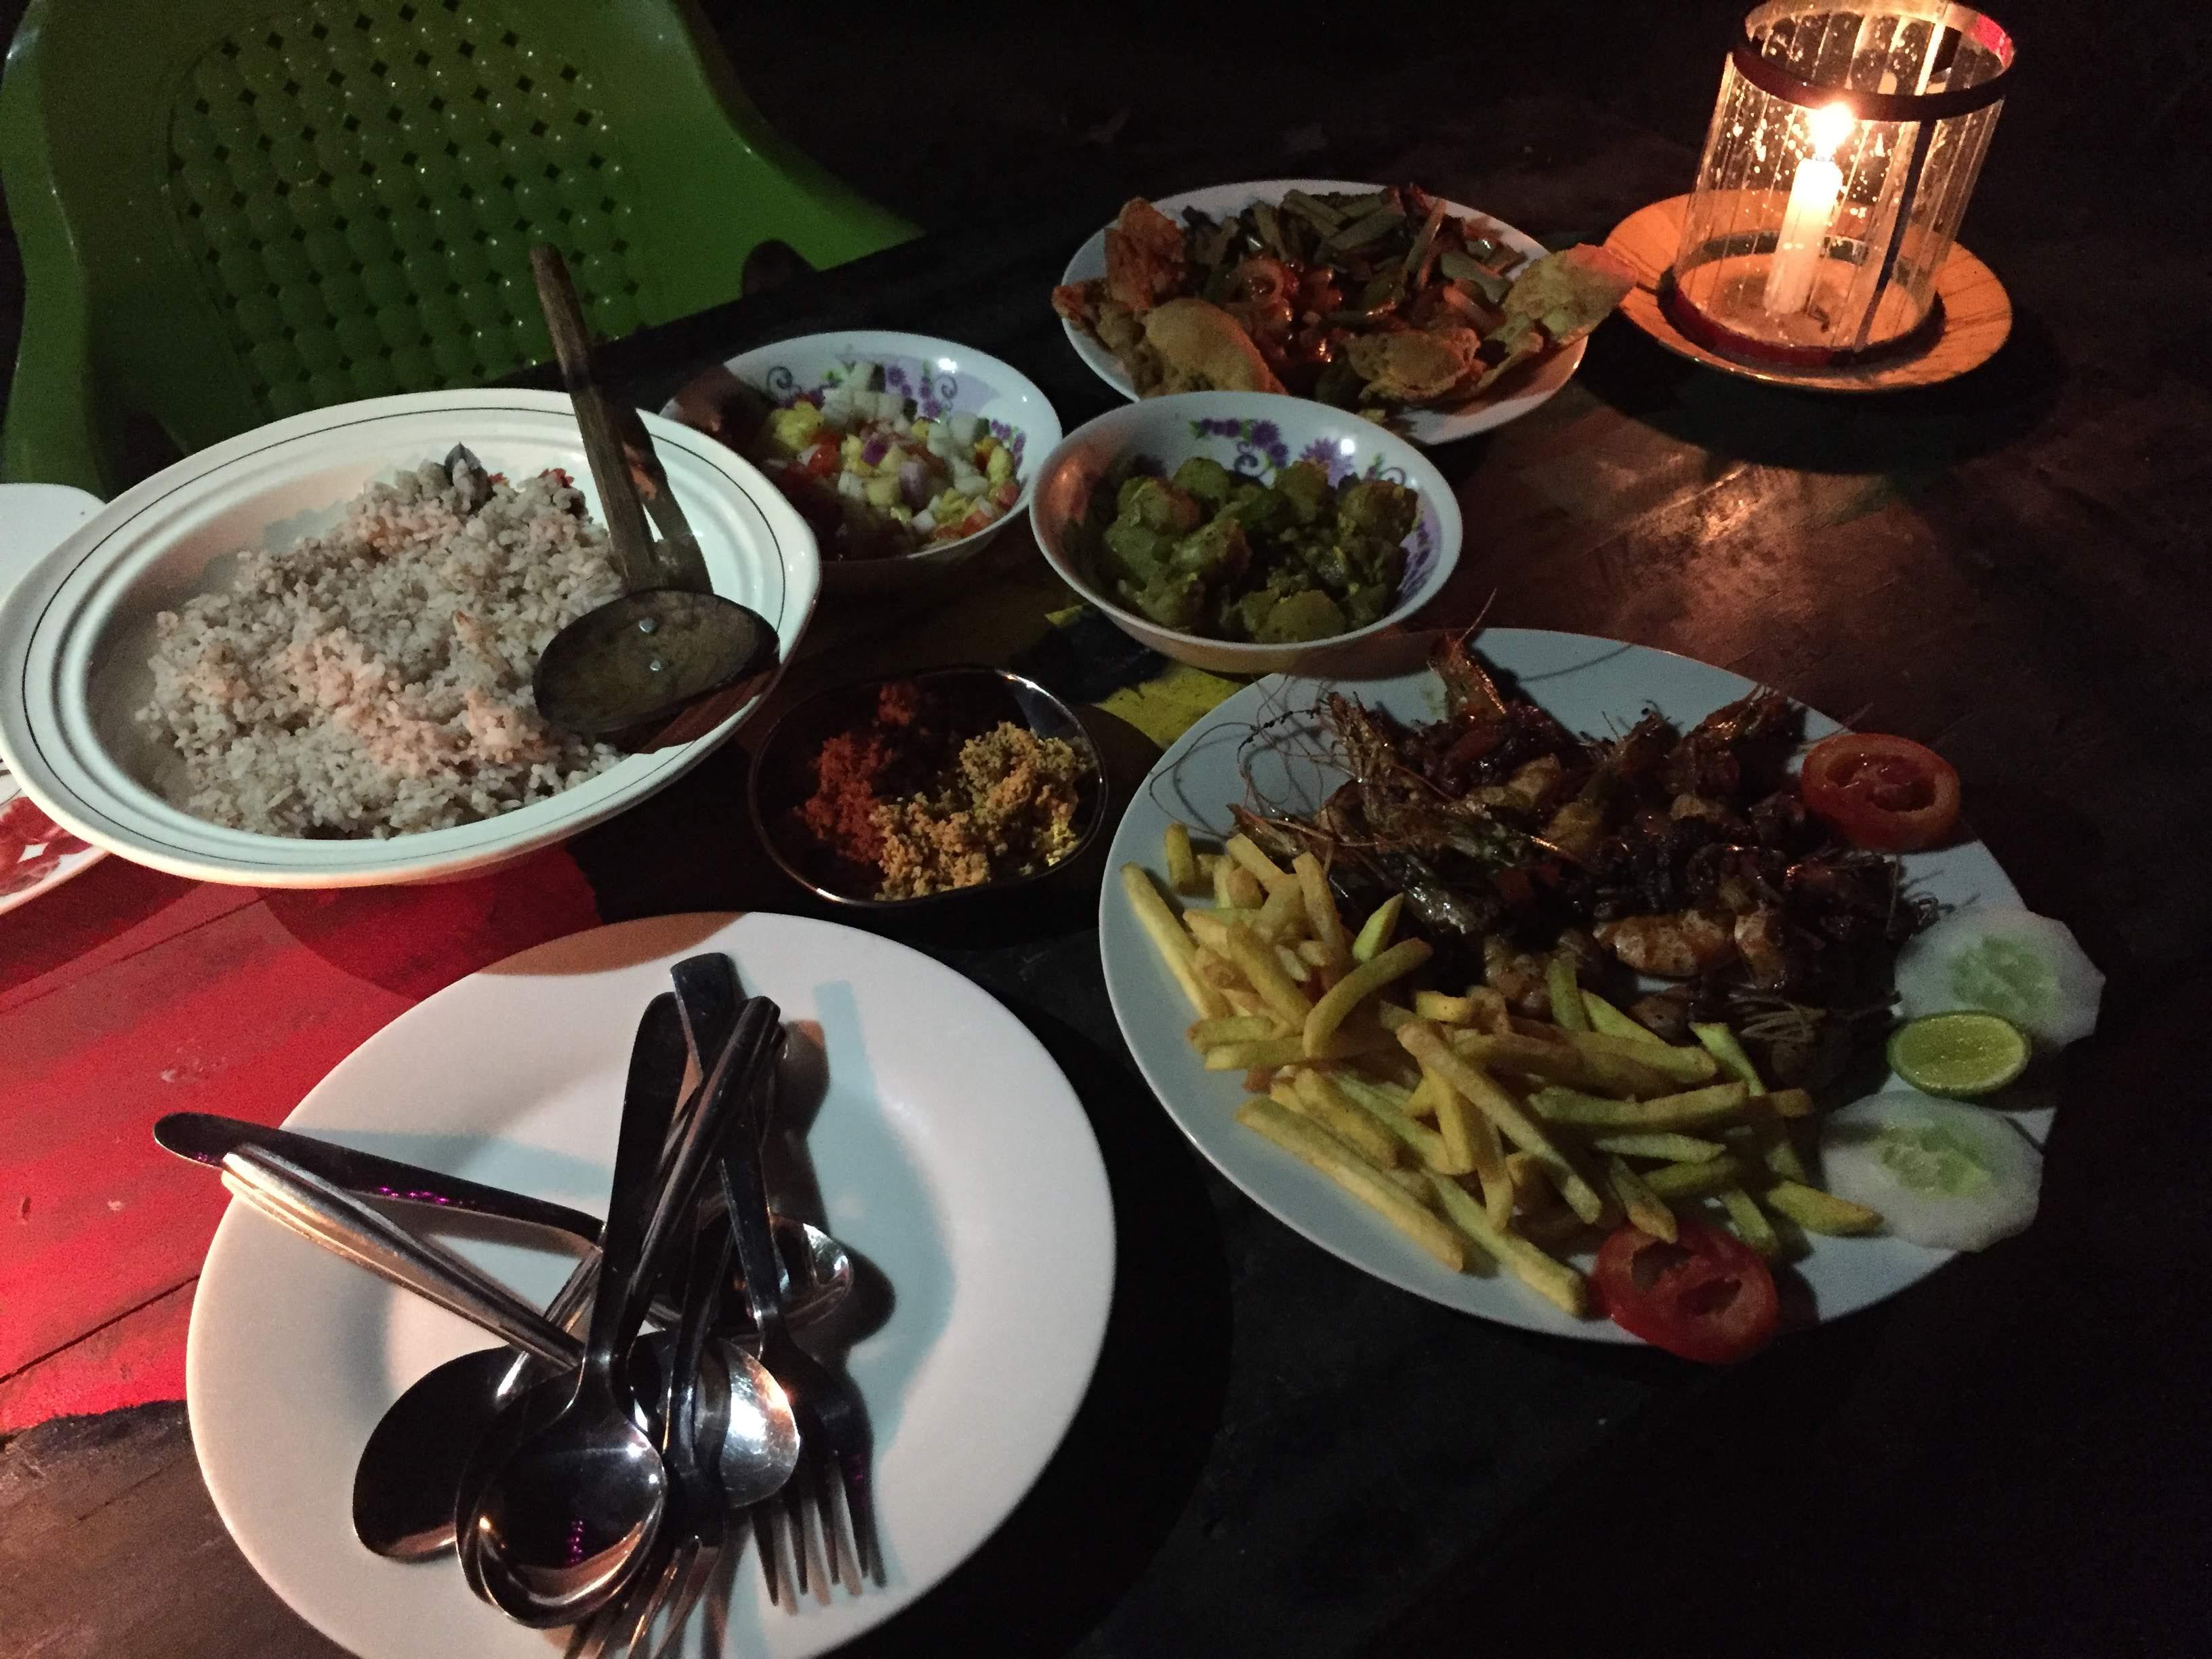 Essen bei Freunden in Tangalle Sri Lanka